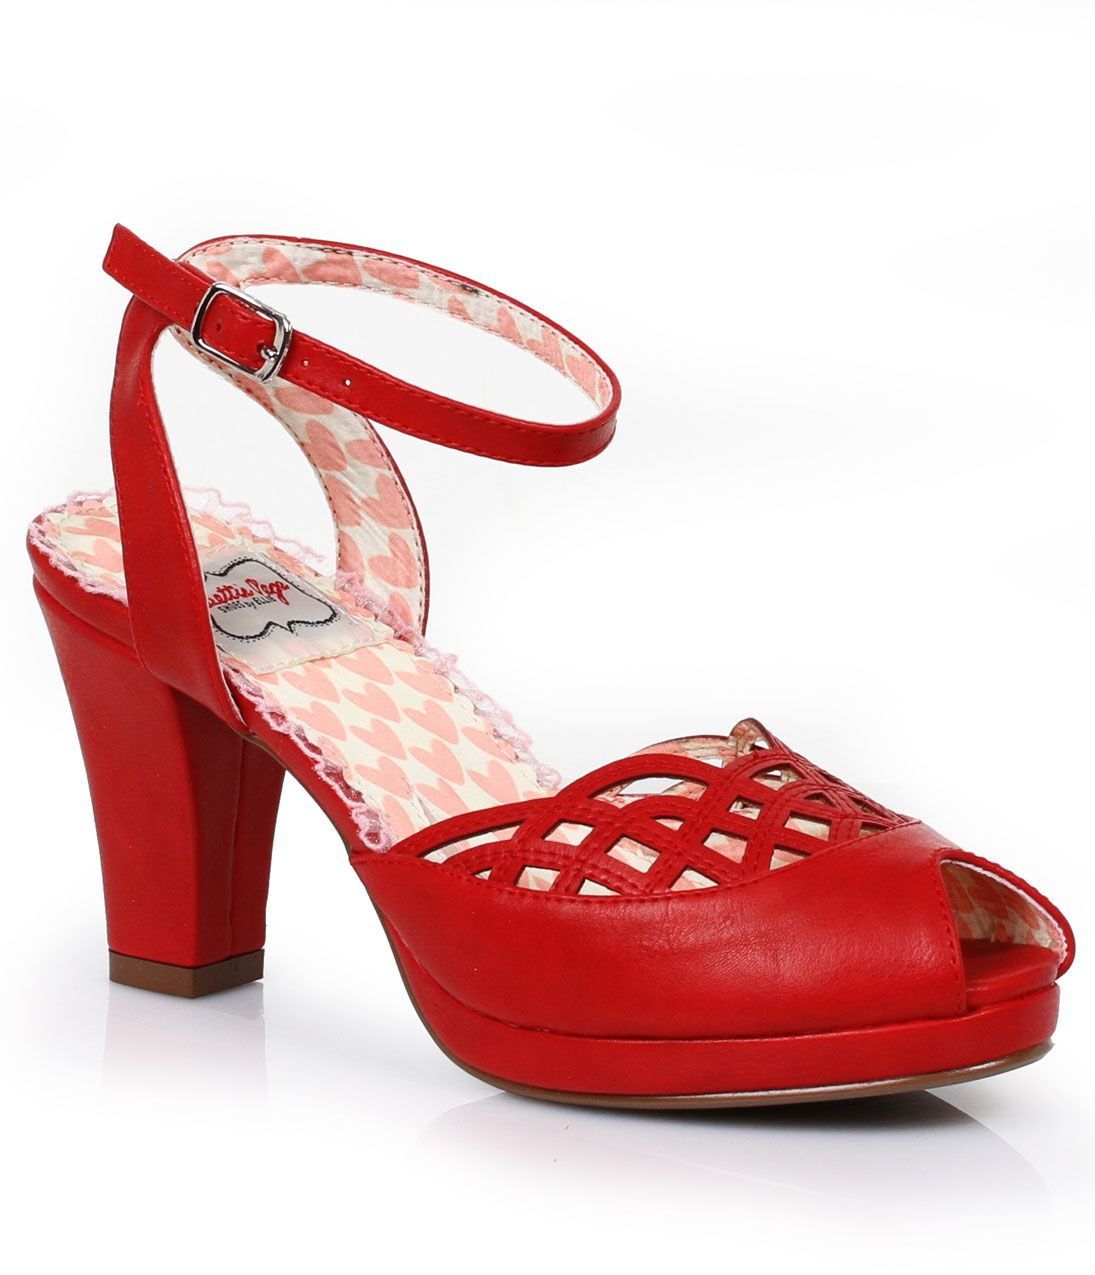 1950sStyleShoes Red Lattice Cutout Darla Vintage Peep Toe Pumps $88.00 AT vintagedancer.com